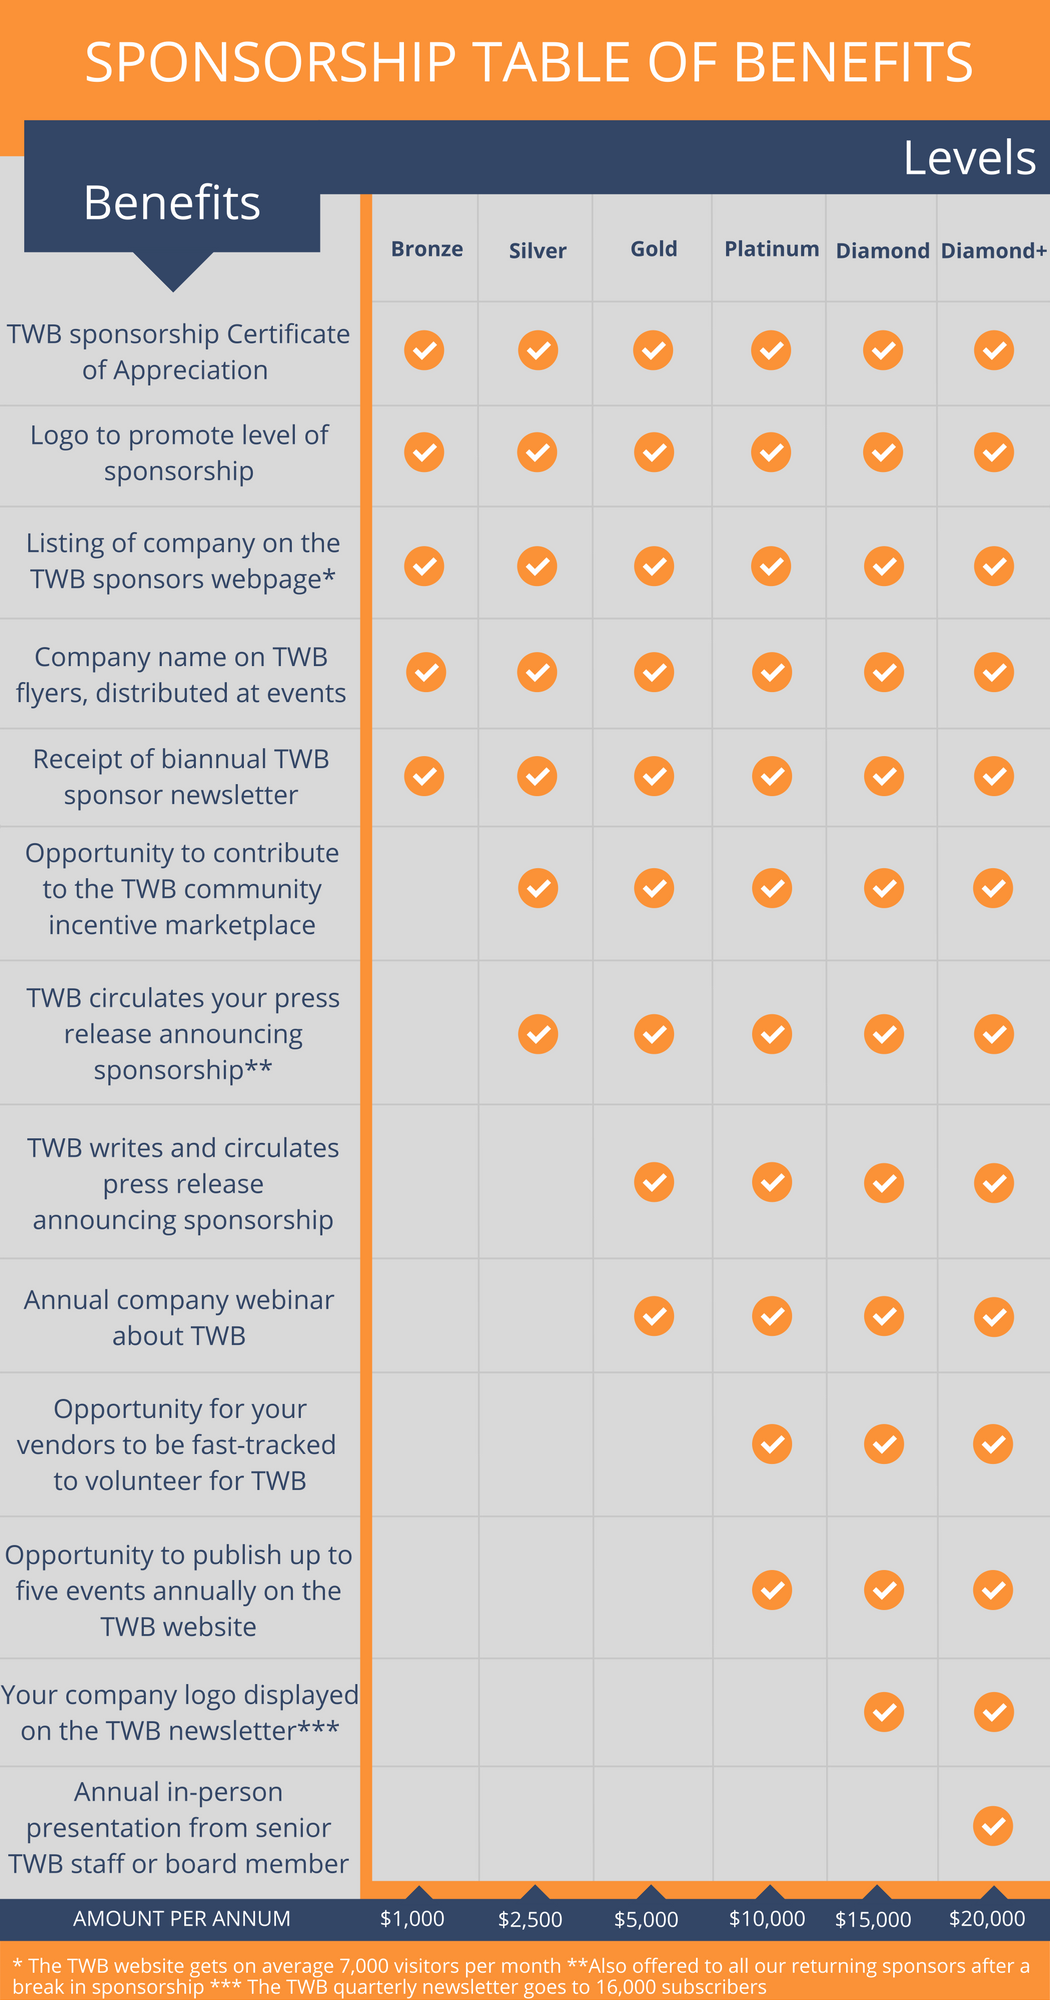 Sponsorship table of benefits